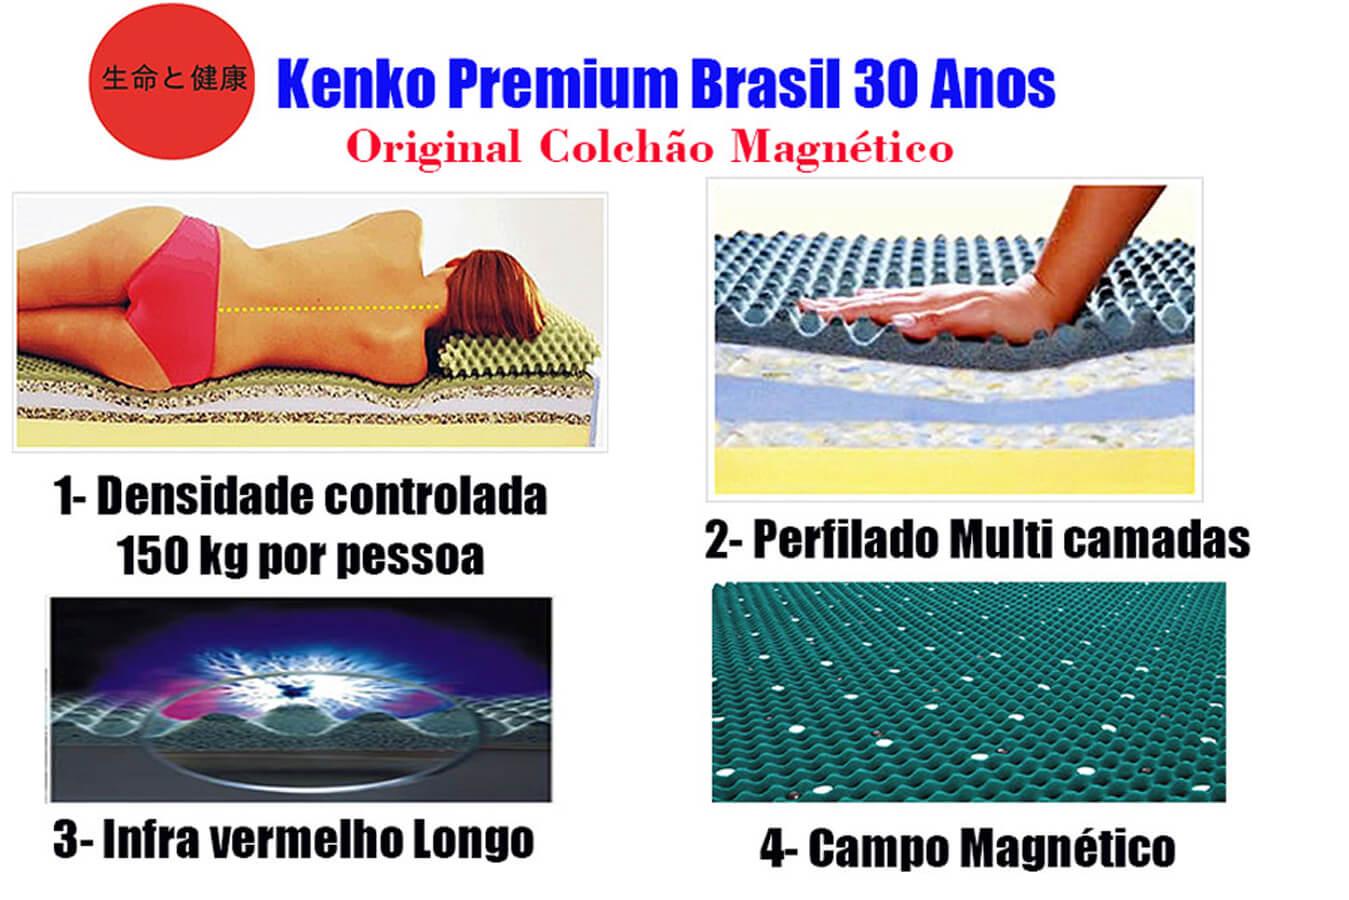 Colchão Magnético Kenko Premium, Modelo HR 29cm Látex - King Size 1,93x2,03  - Kenko Premium Colchões